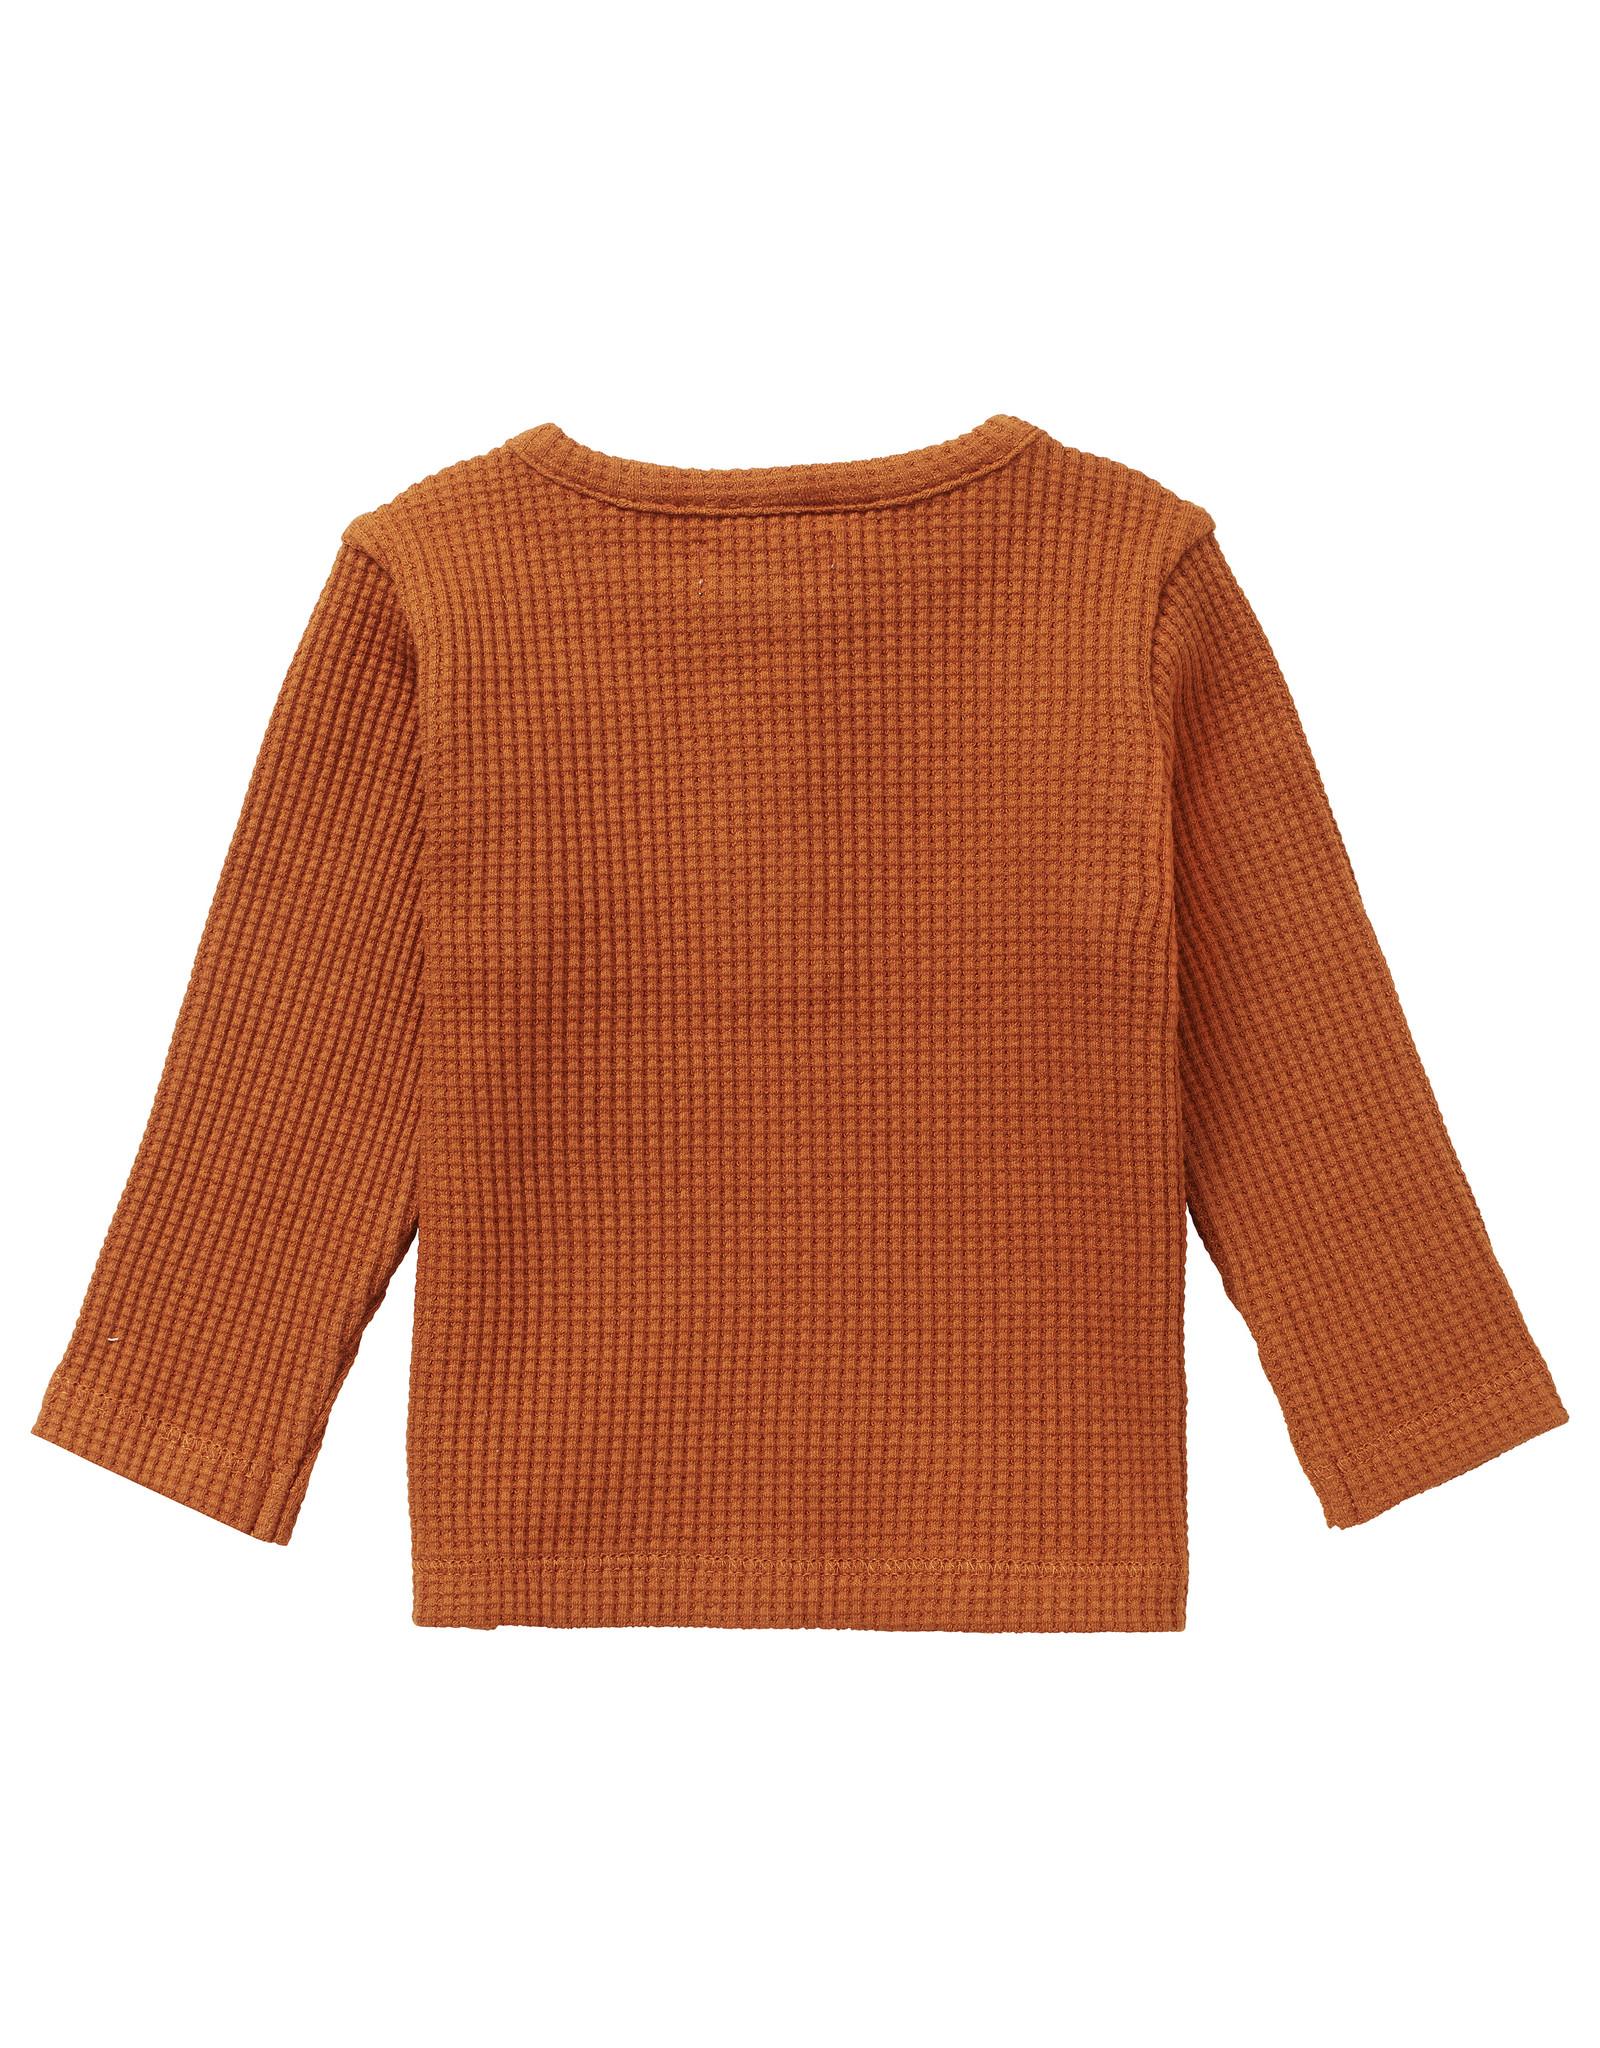 Noppies U T-shirt LS Spilsby, Roasted Pecan